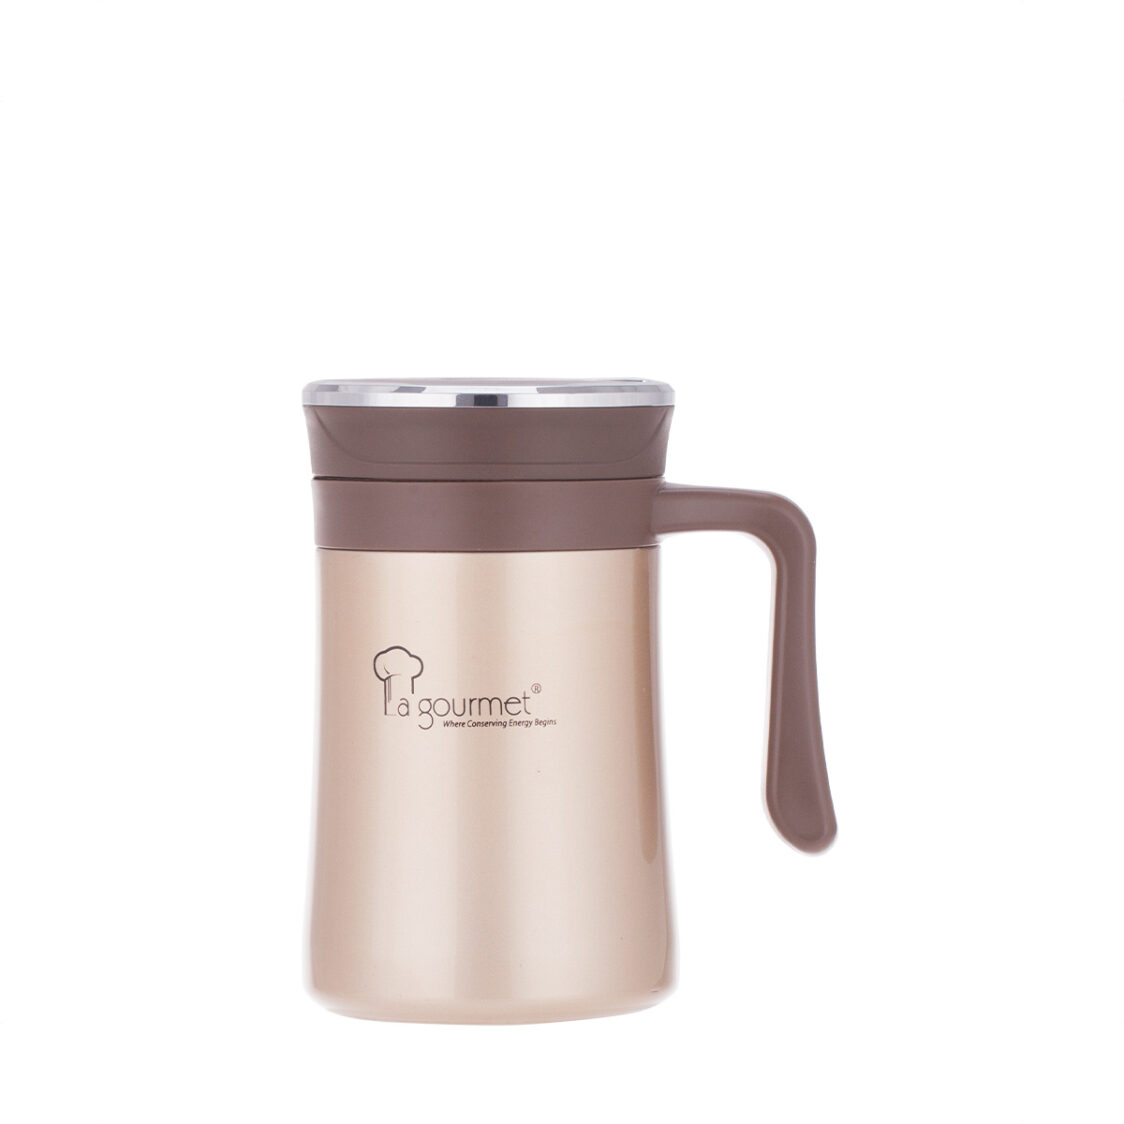 La Gourmet Gold 05L Thermal Mug LGRG353207